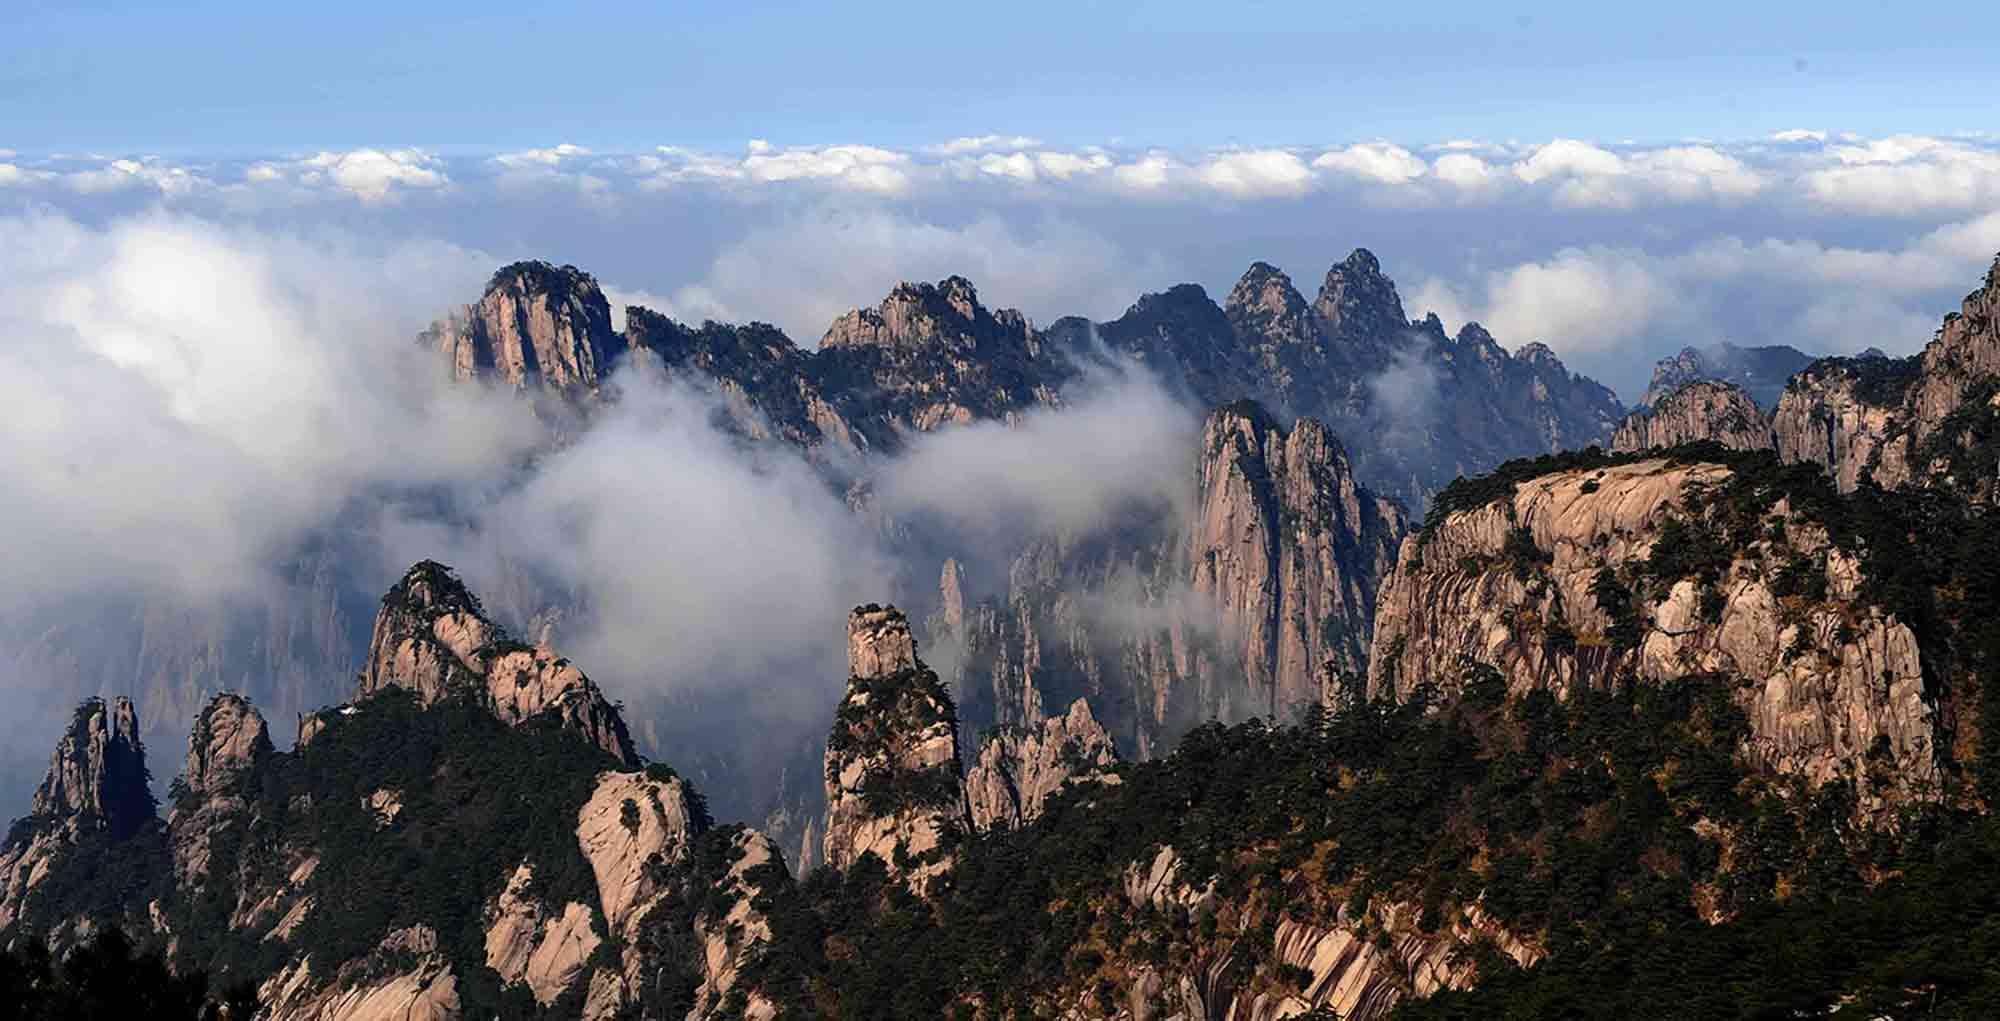 montagne_jaune_thé_Huang_Shan_Mao_Feng